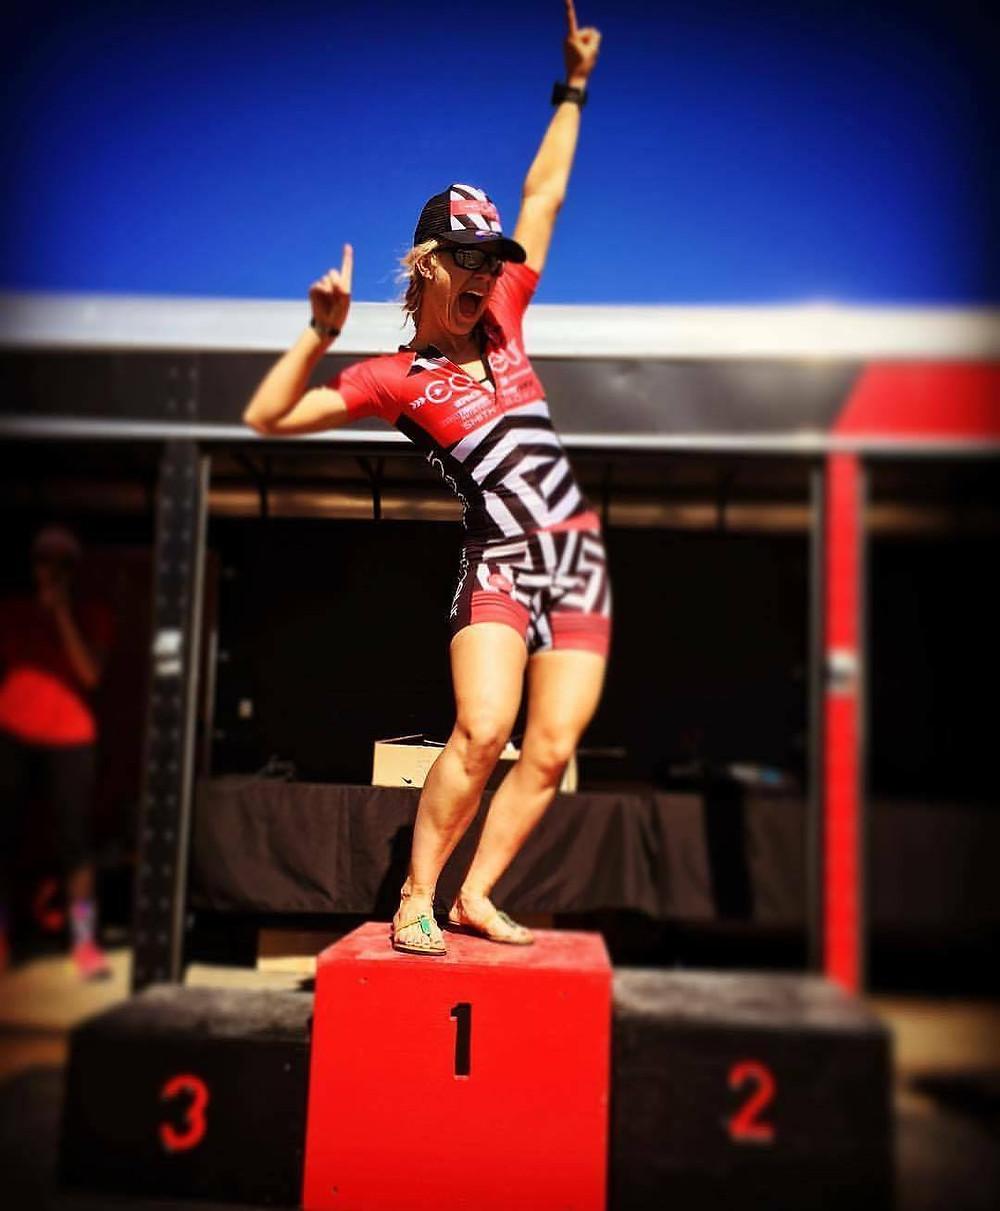 Feeling like I won the whole season at the Las Vegas Triathlon.